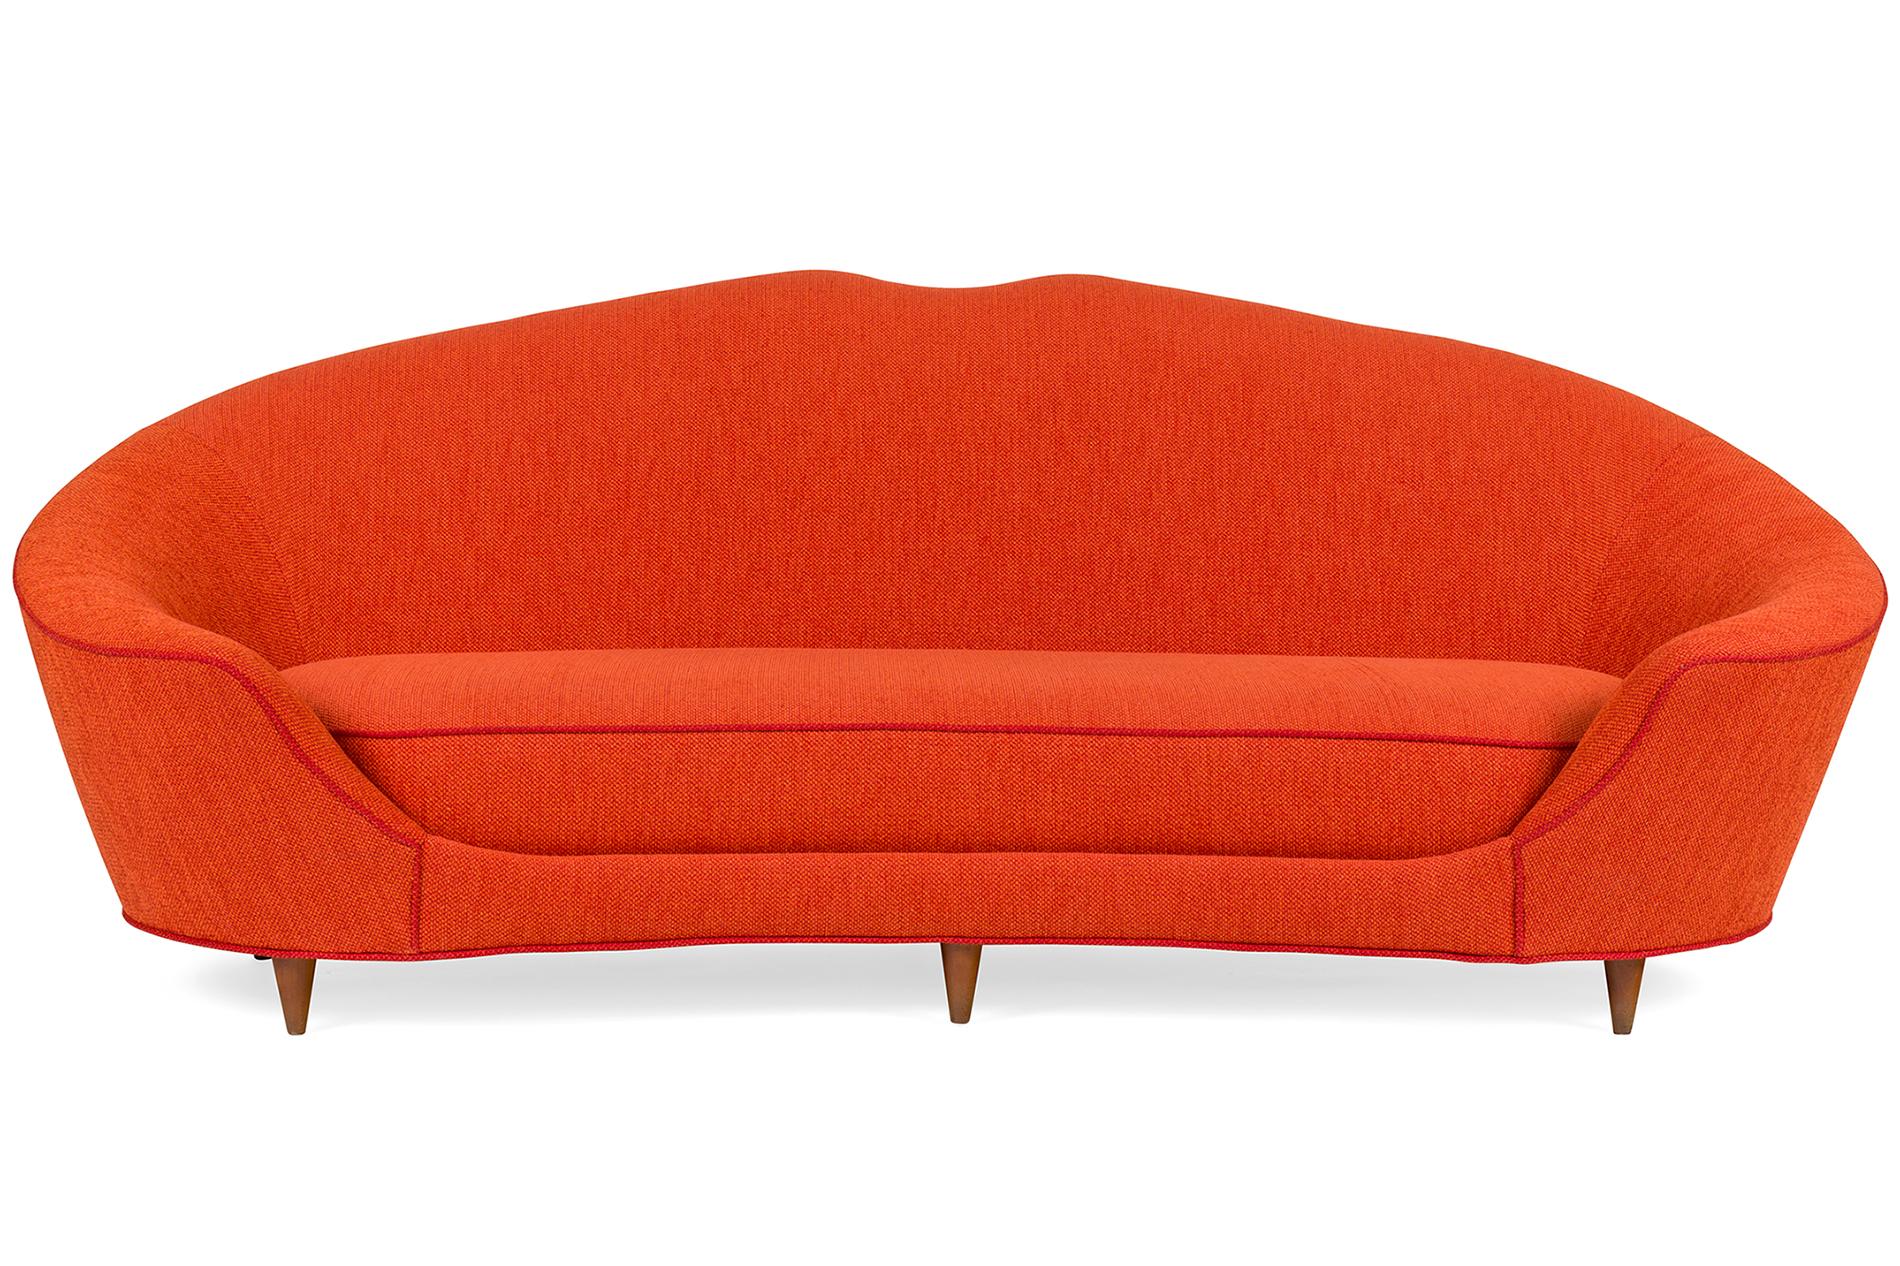 Lost City Image 16_Orange Sofa